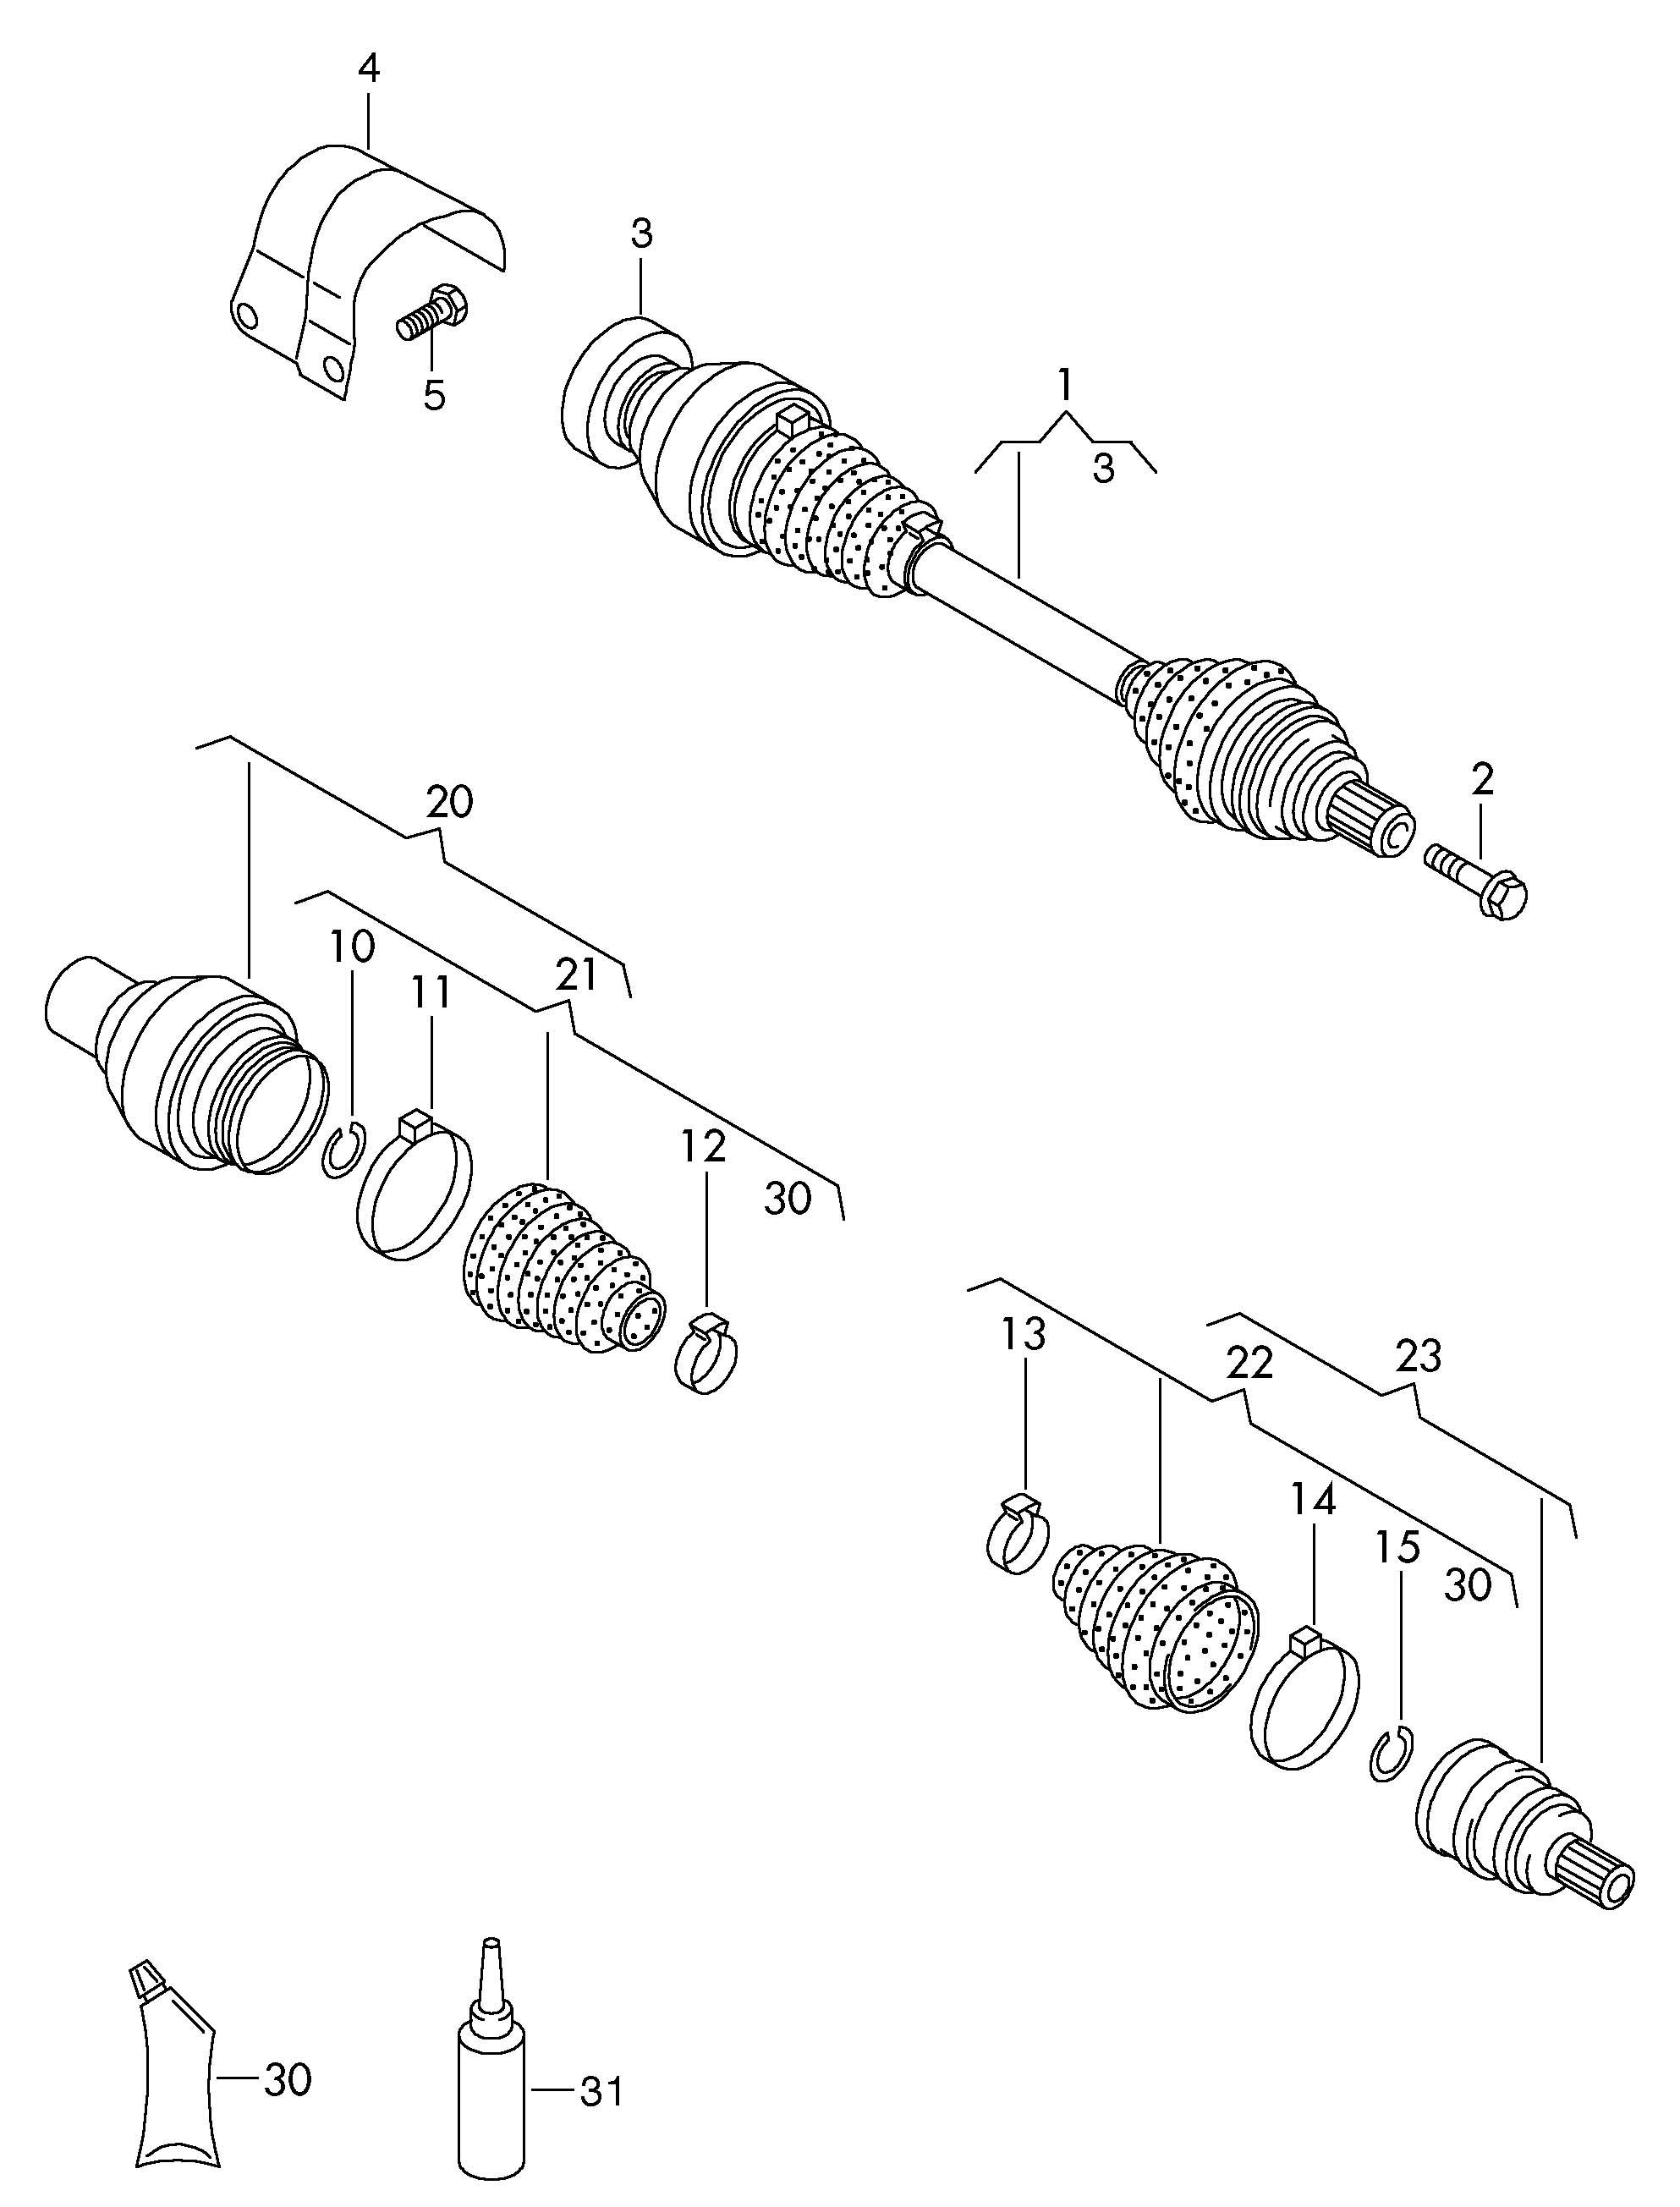 Volkswagen Tiguan Drive shaft for 6 speed manual transmiss